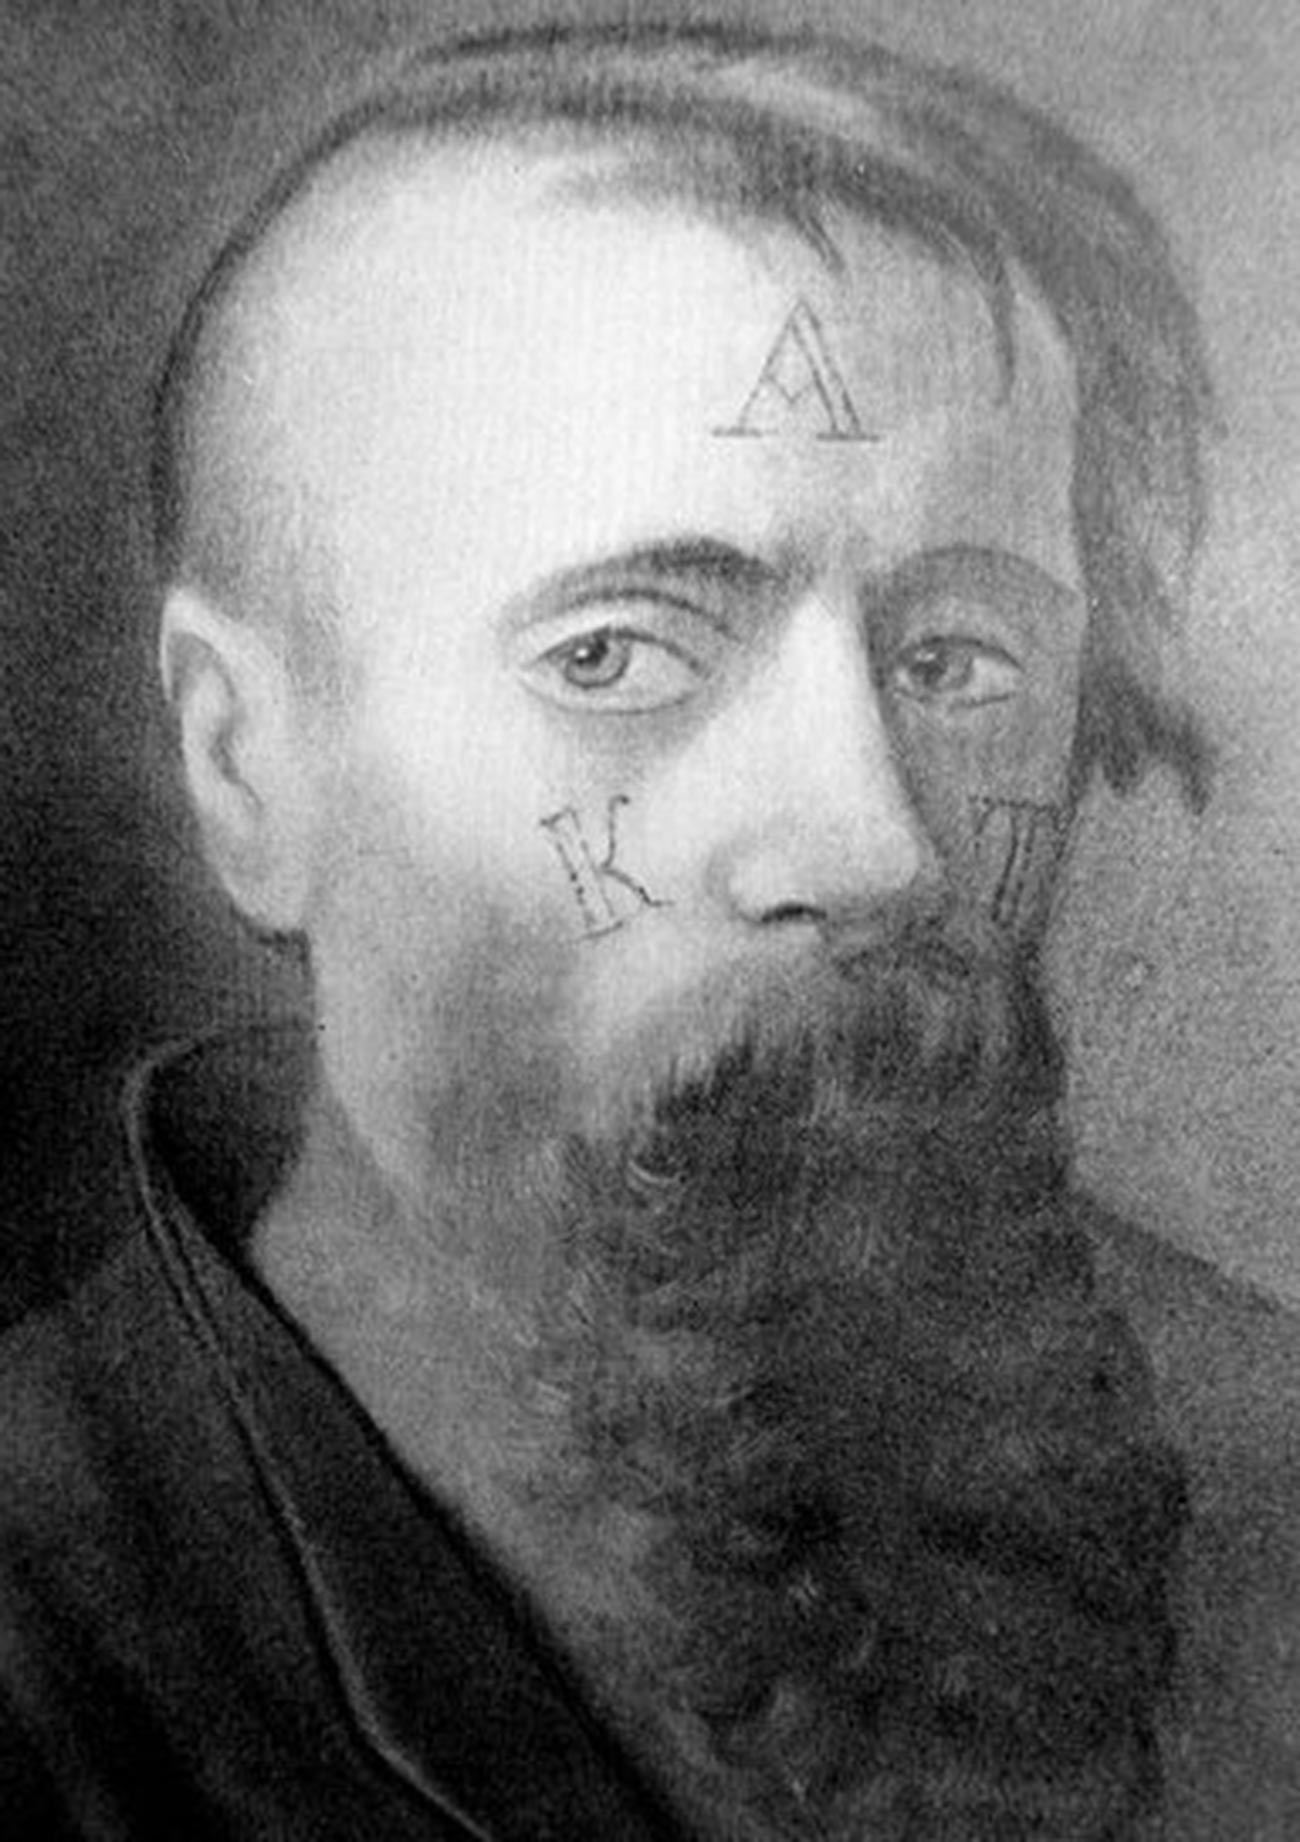 Cara pengecapan dilakukan pada wajah narapidana di Rusia.